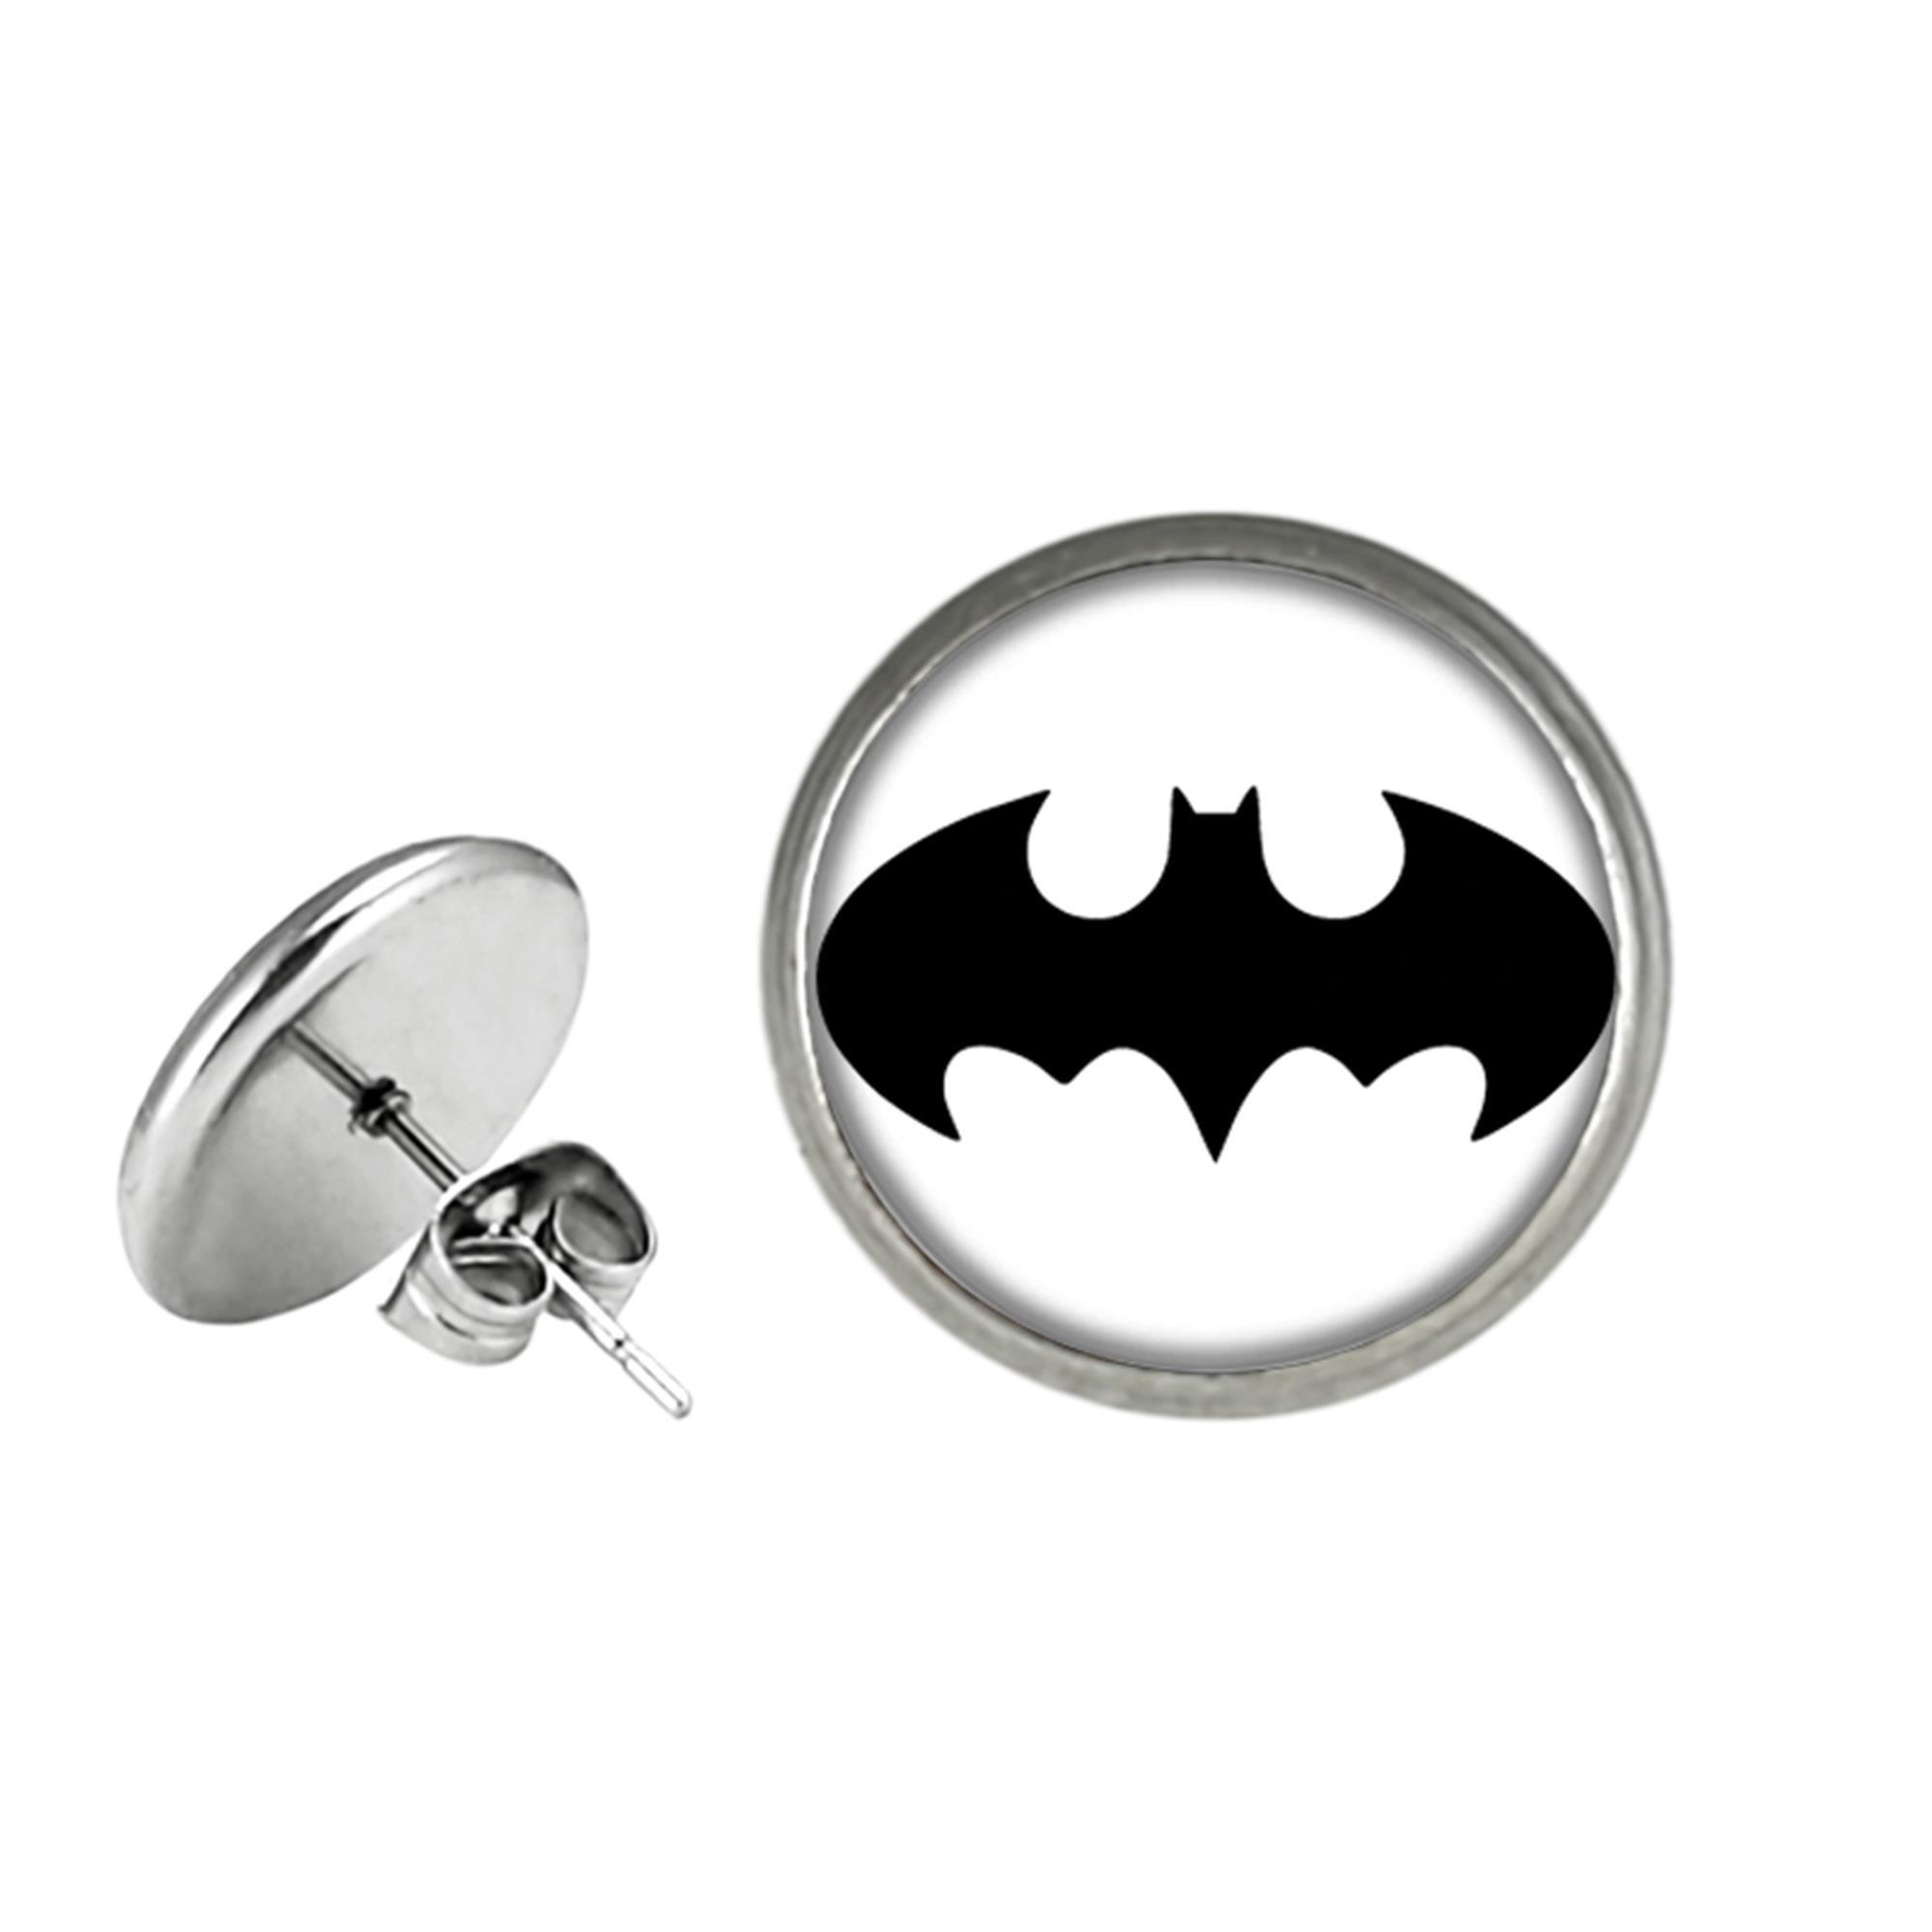 Batman Premium Quality Silvertone Post Stud Earrings